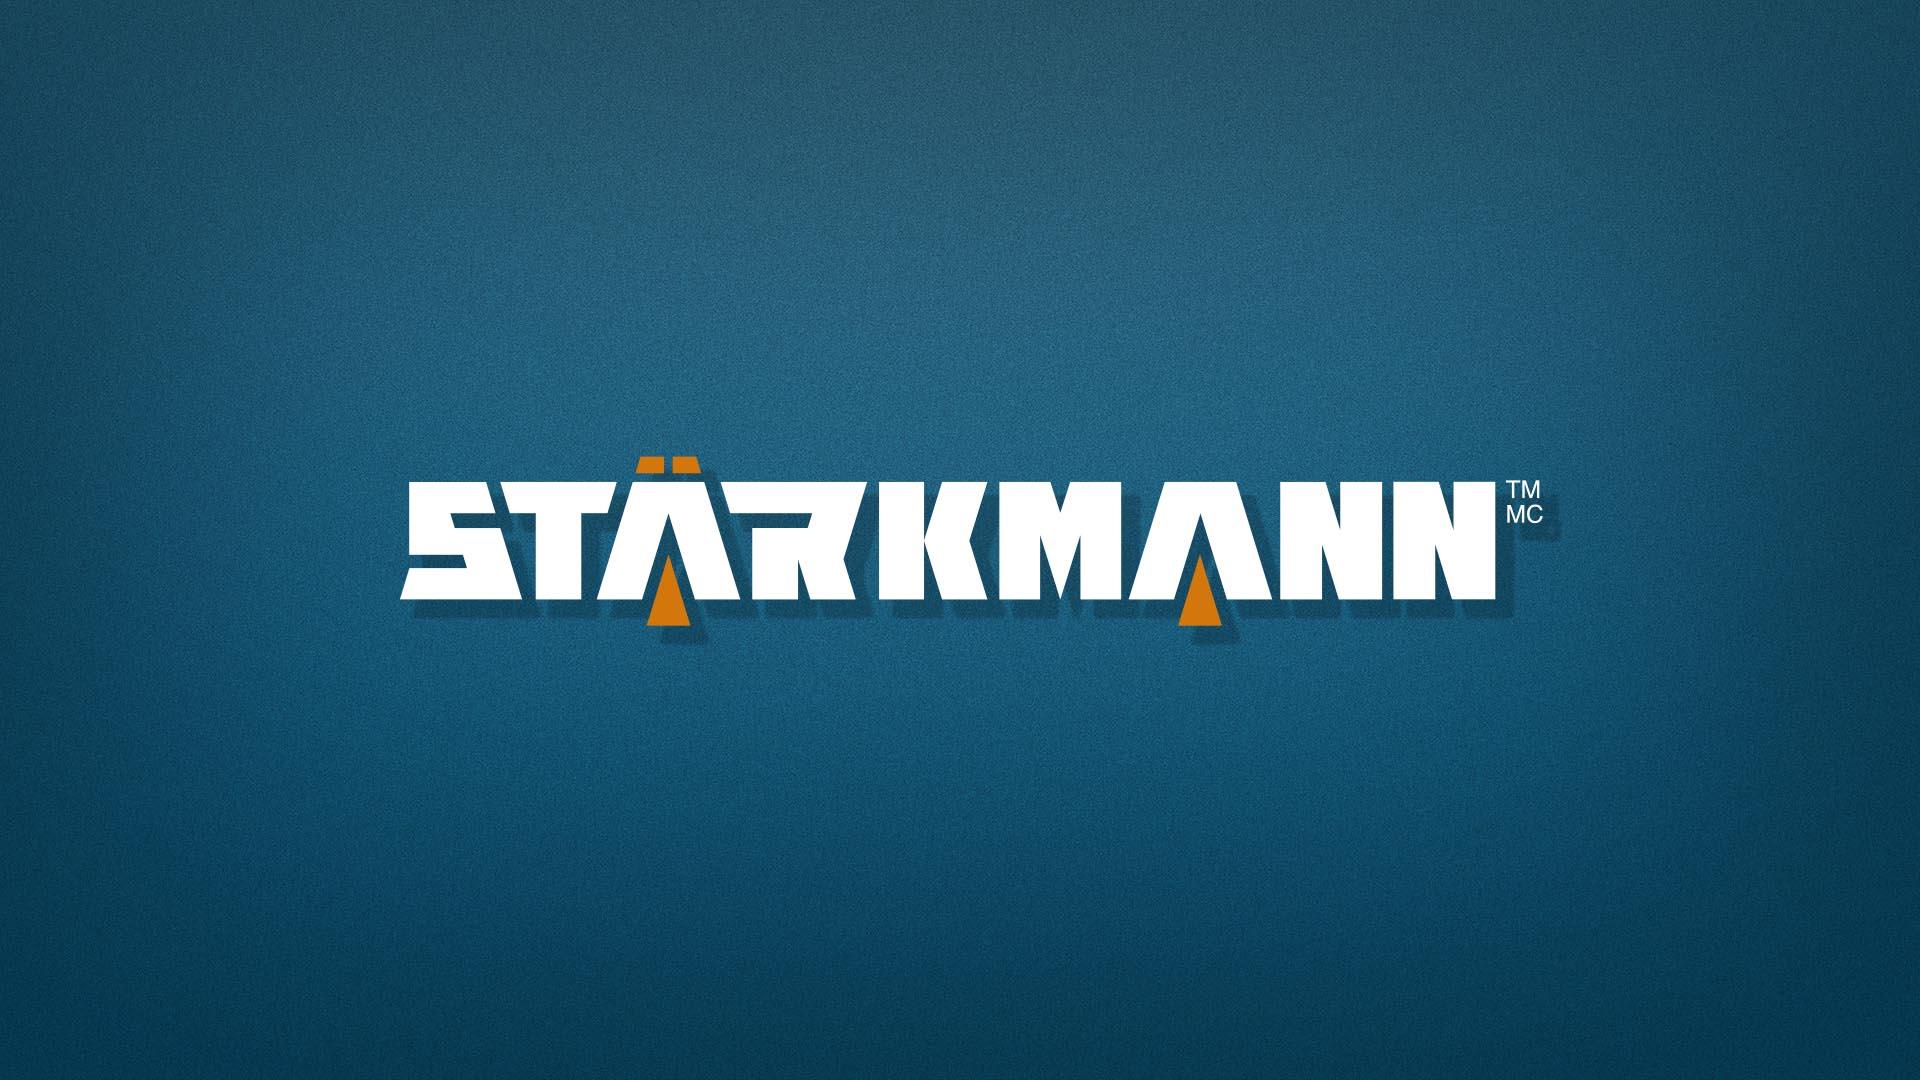 Starkman Identity